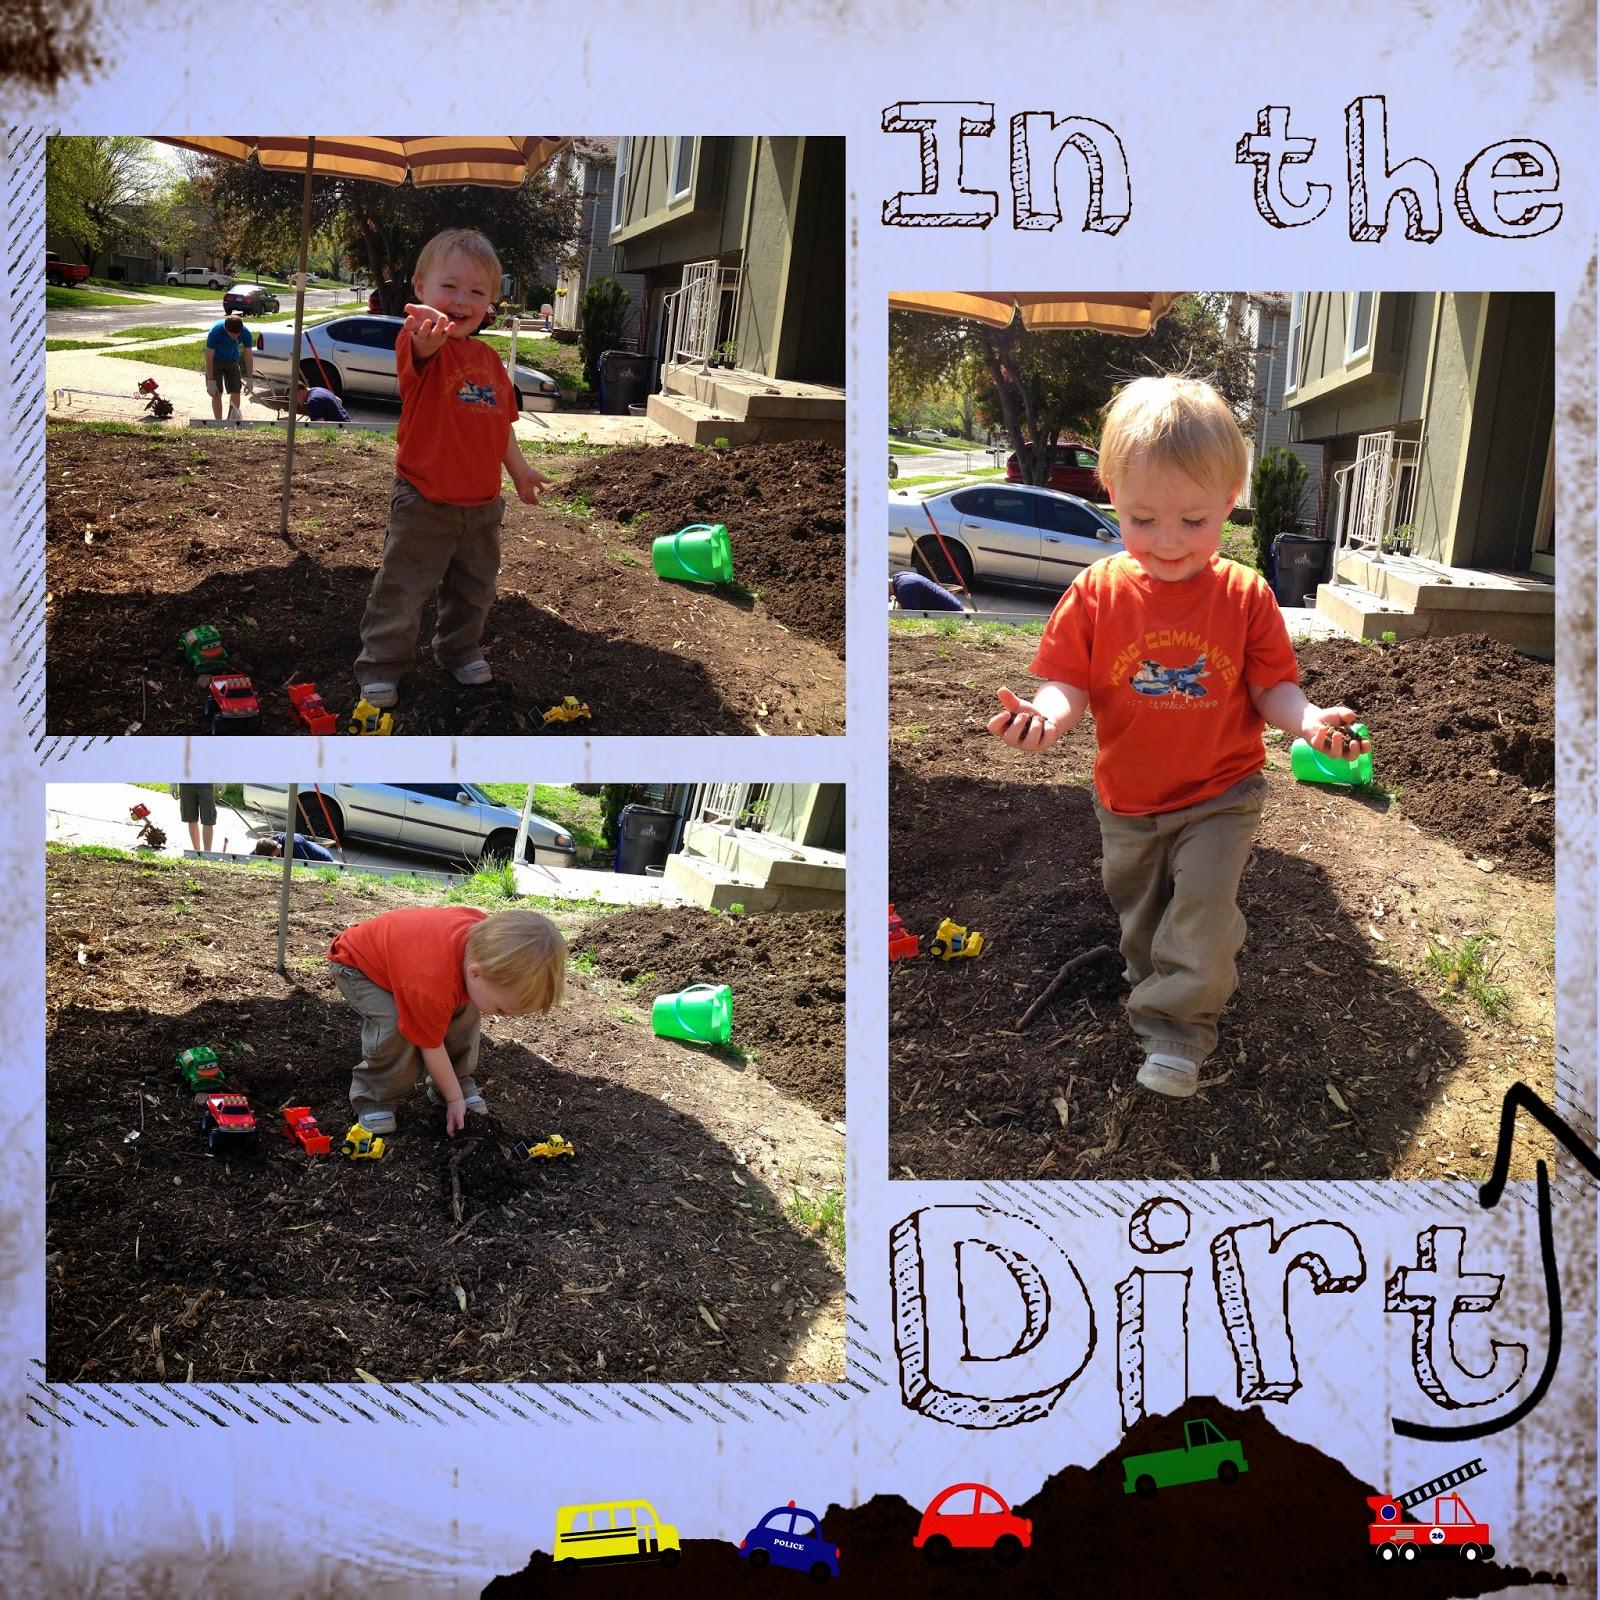 http://1.bp.blogspot.com/-SwHgv0YcUFo/U8NRveDFPPI/AAAAAAAACgI/daT0H7o9GMc/s1600/In+the+dirt.jpg